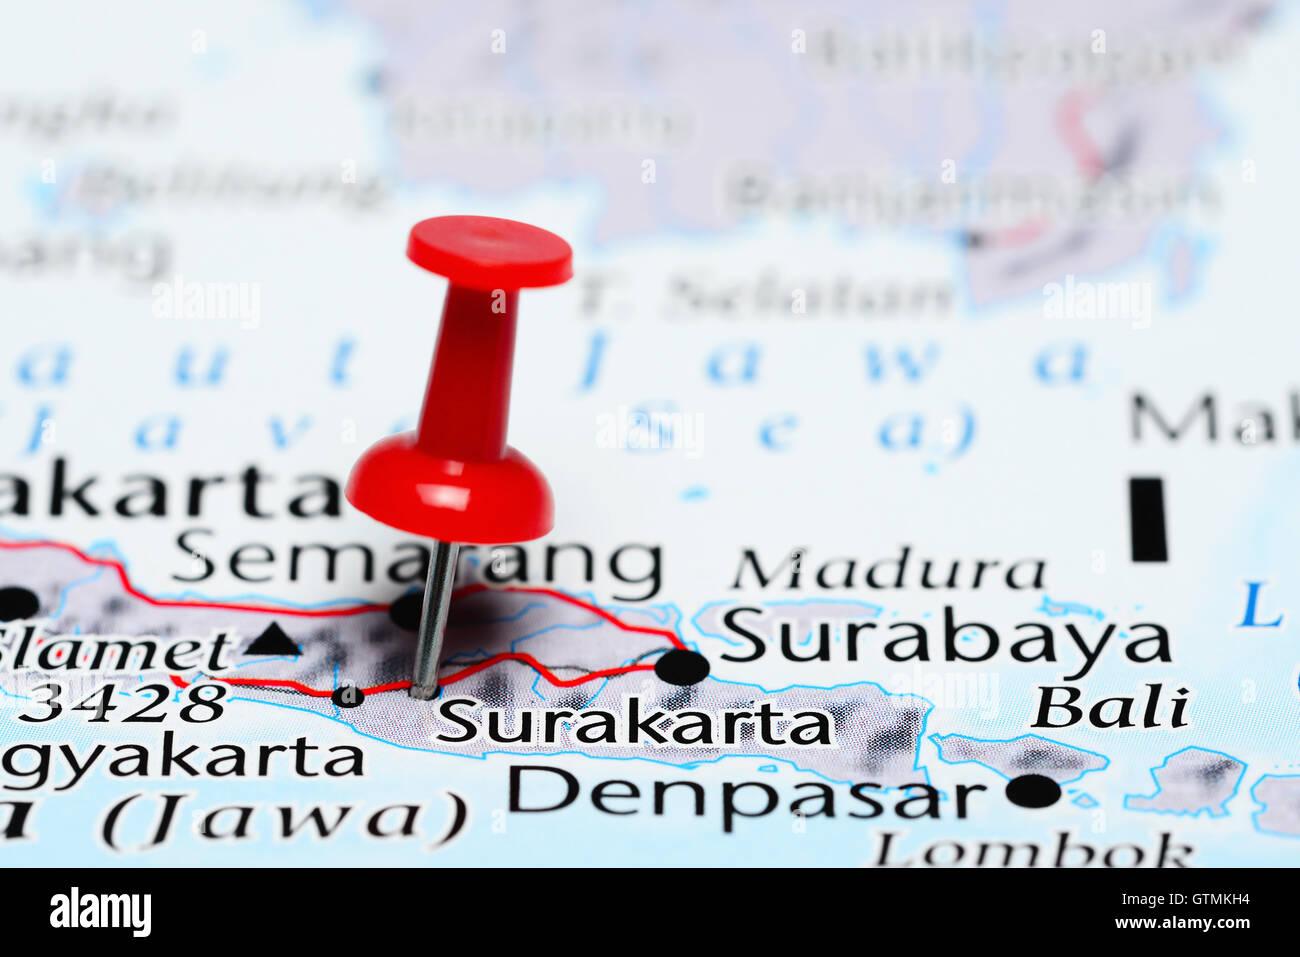 Surakarta pinned on a map of Indonesia Stock Photo: 118468368 - Alamy